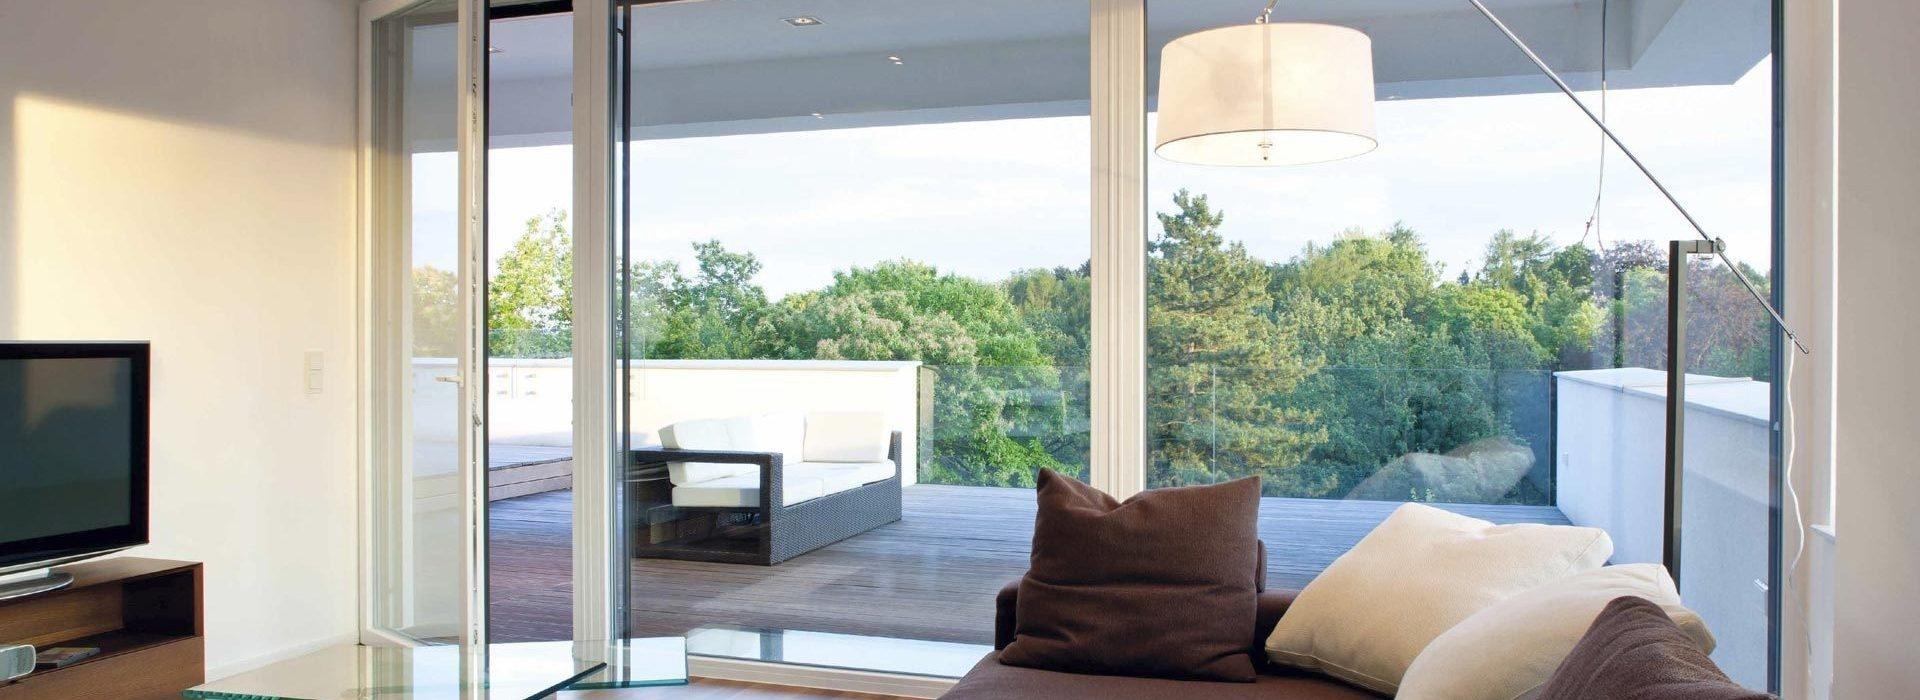 willkommen opitz. Black Bedroom Furniture Sets. Home Design Ideas